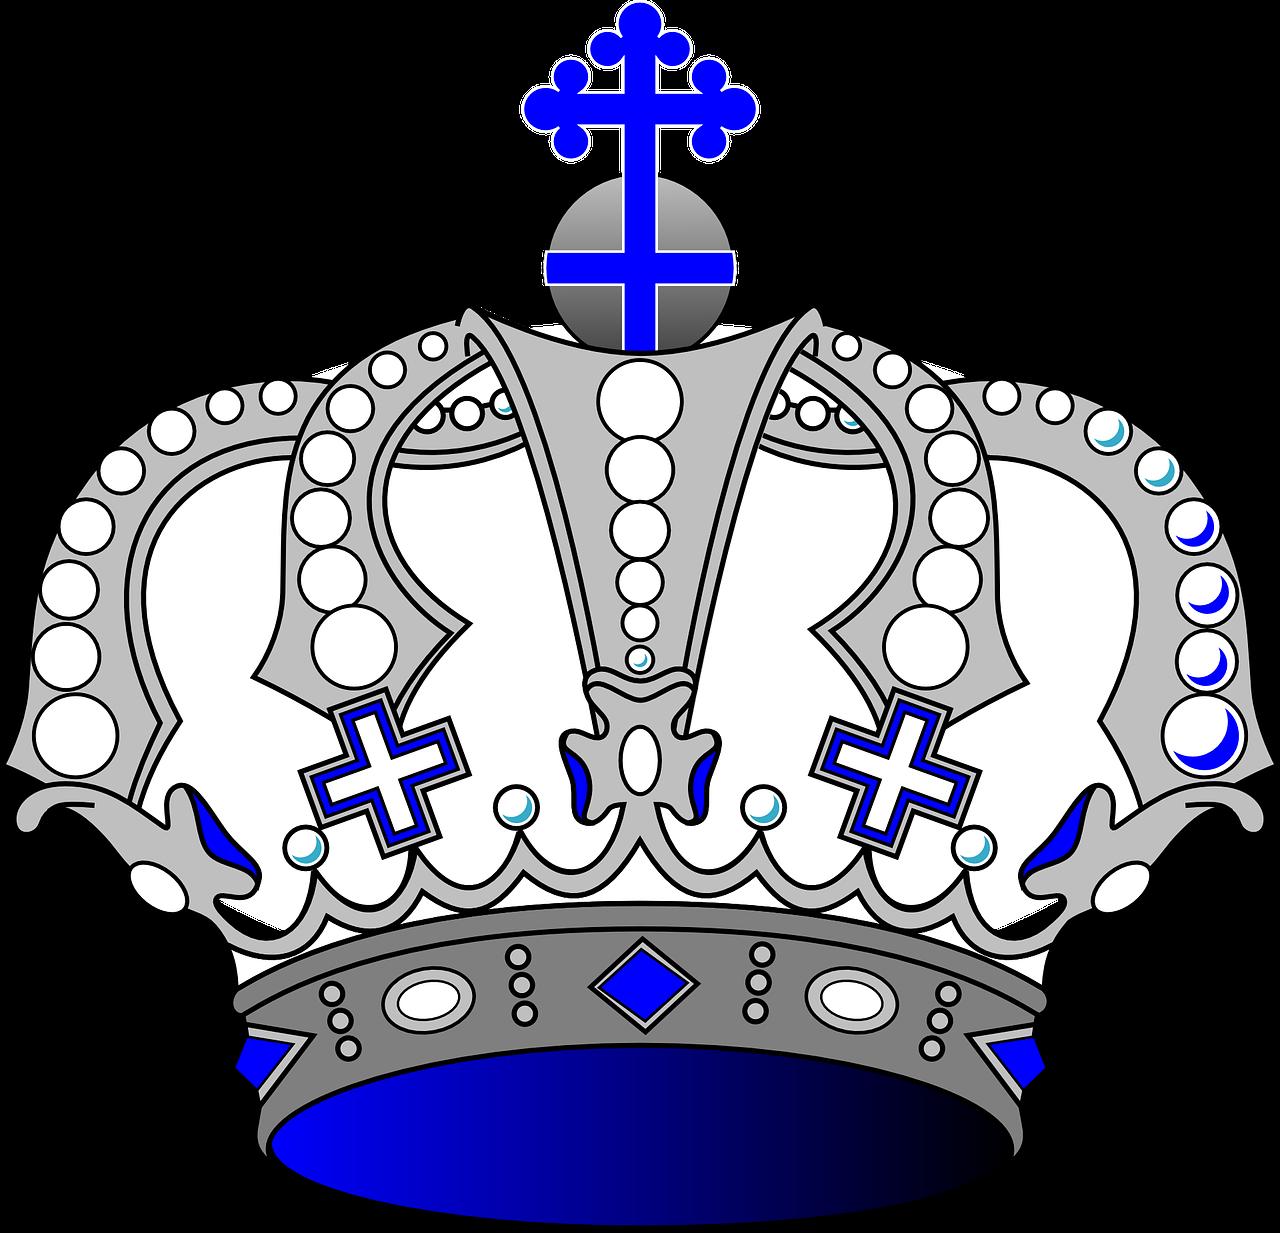 1280x1233 Crown King Royal Prince History Transparent Image Crown